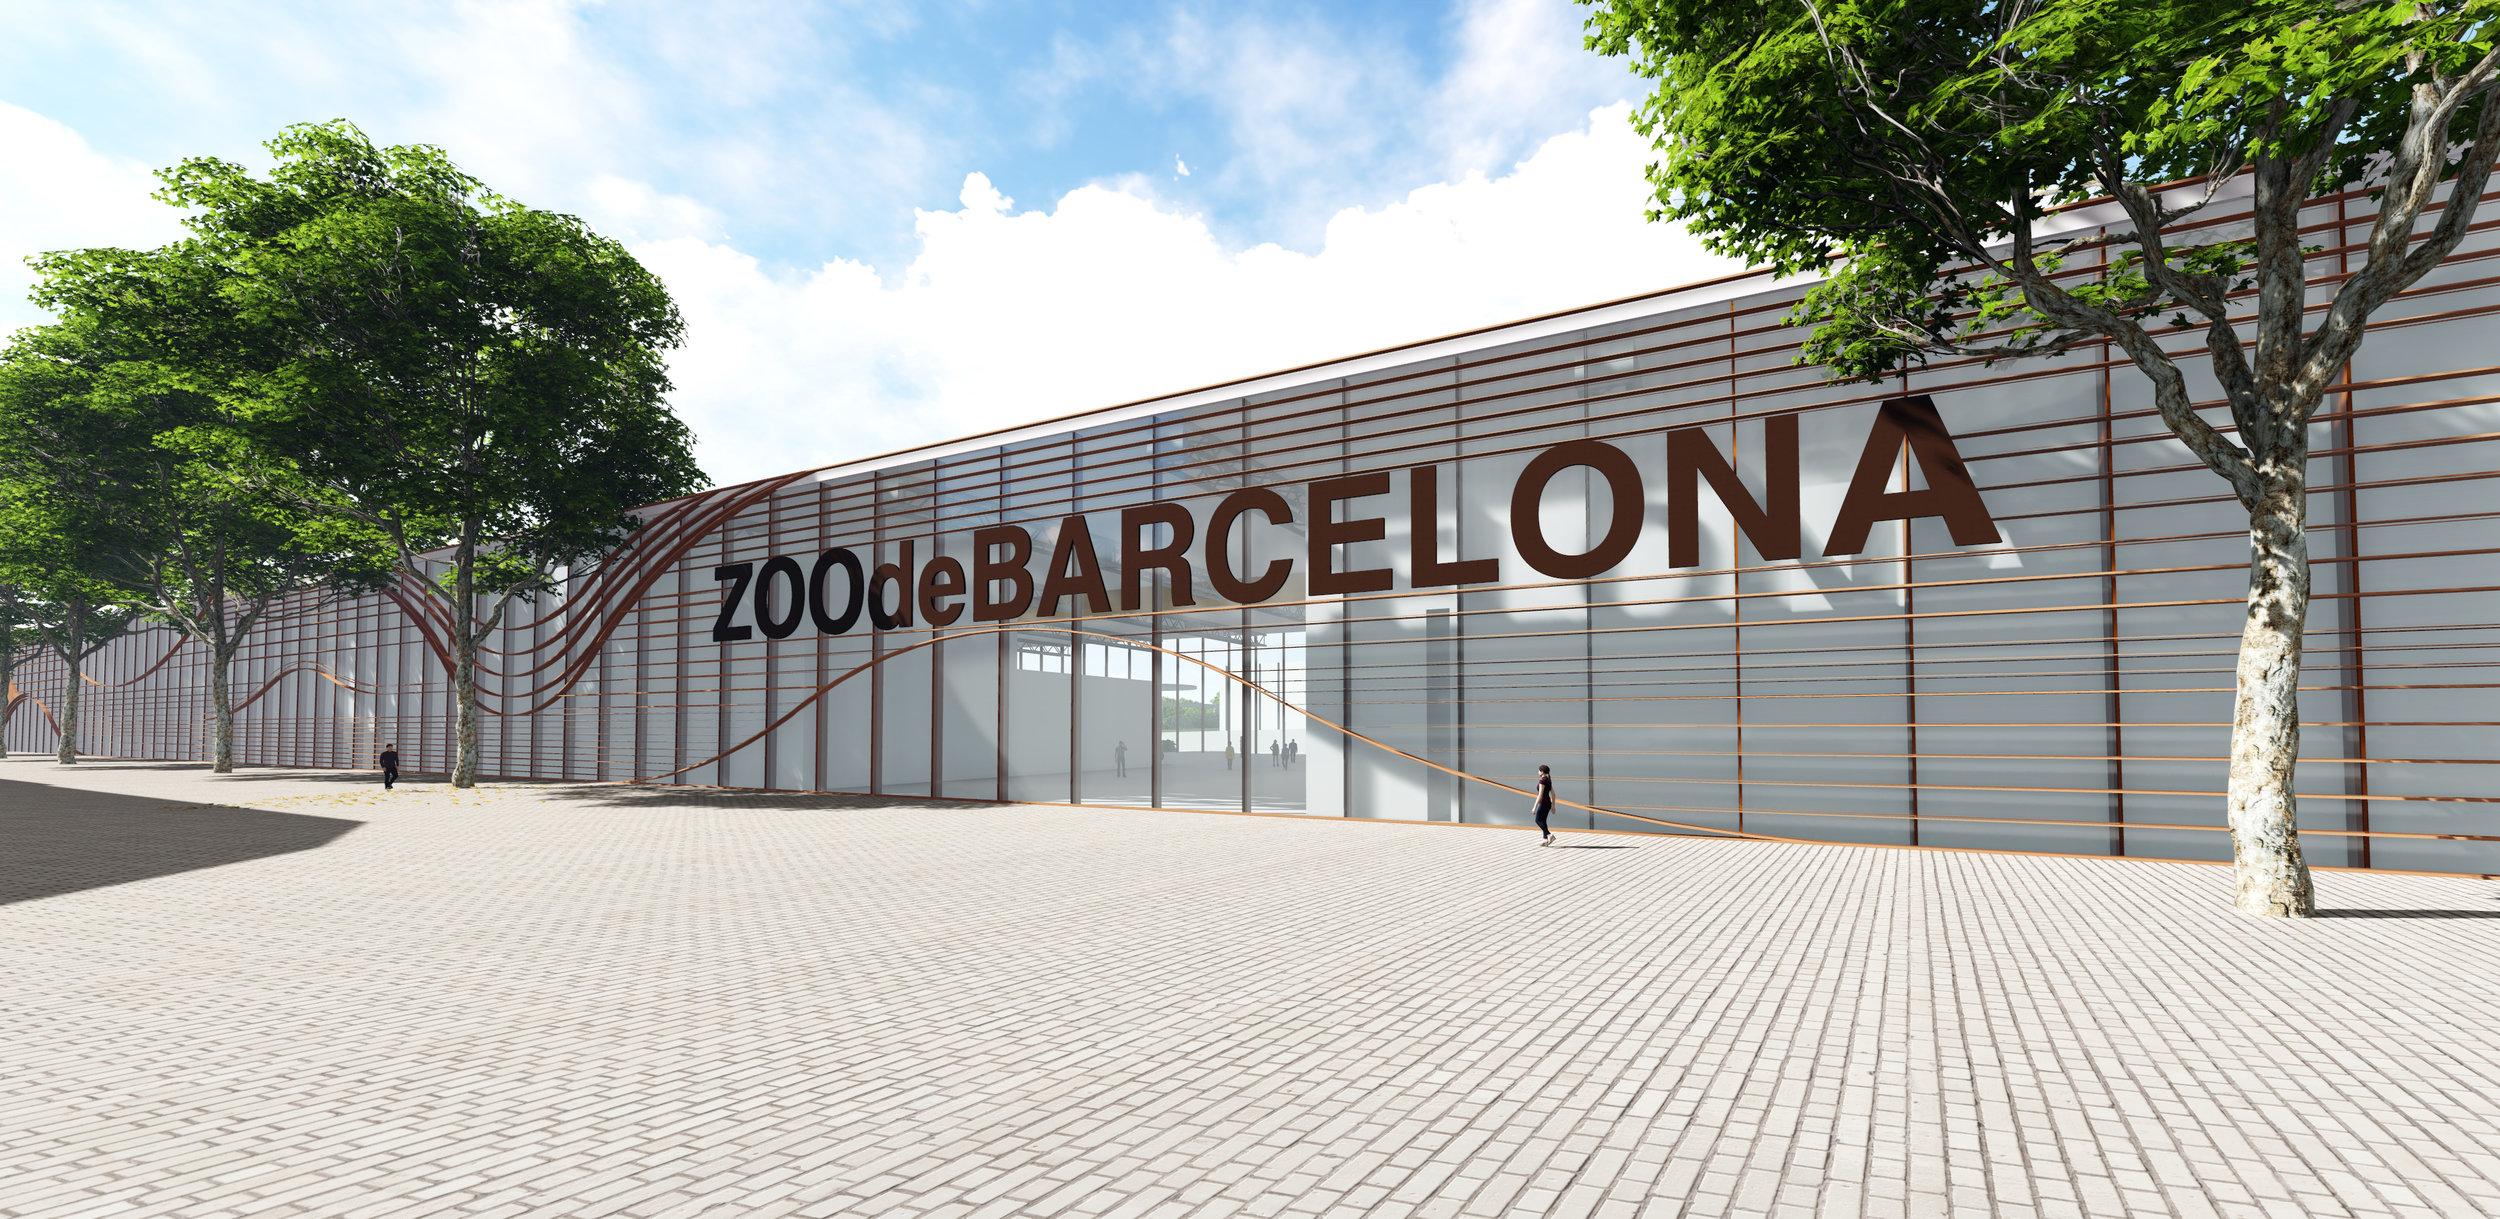 hinterlands_ecoregional zoo_06.jpg